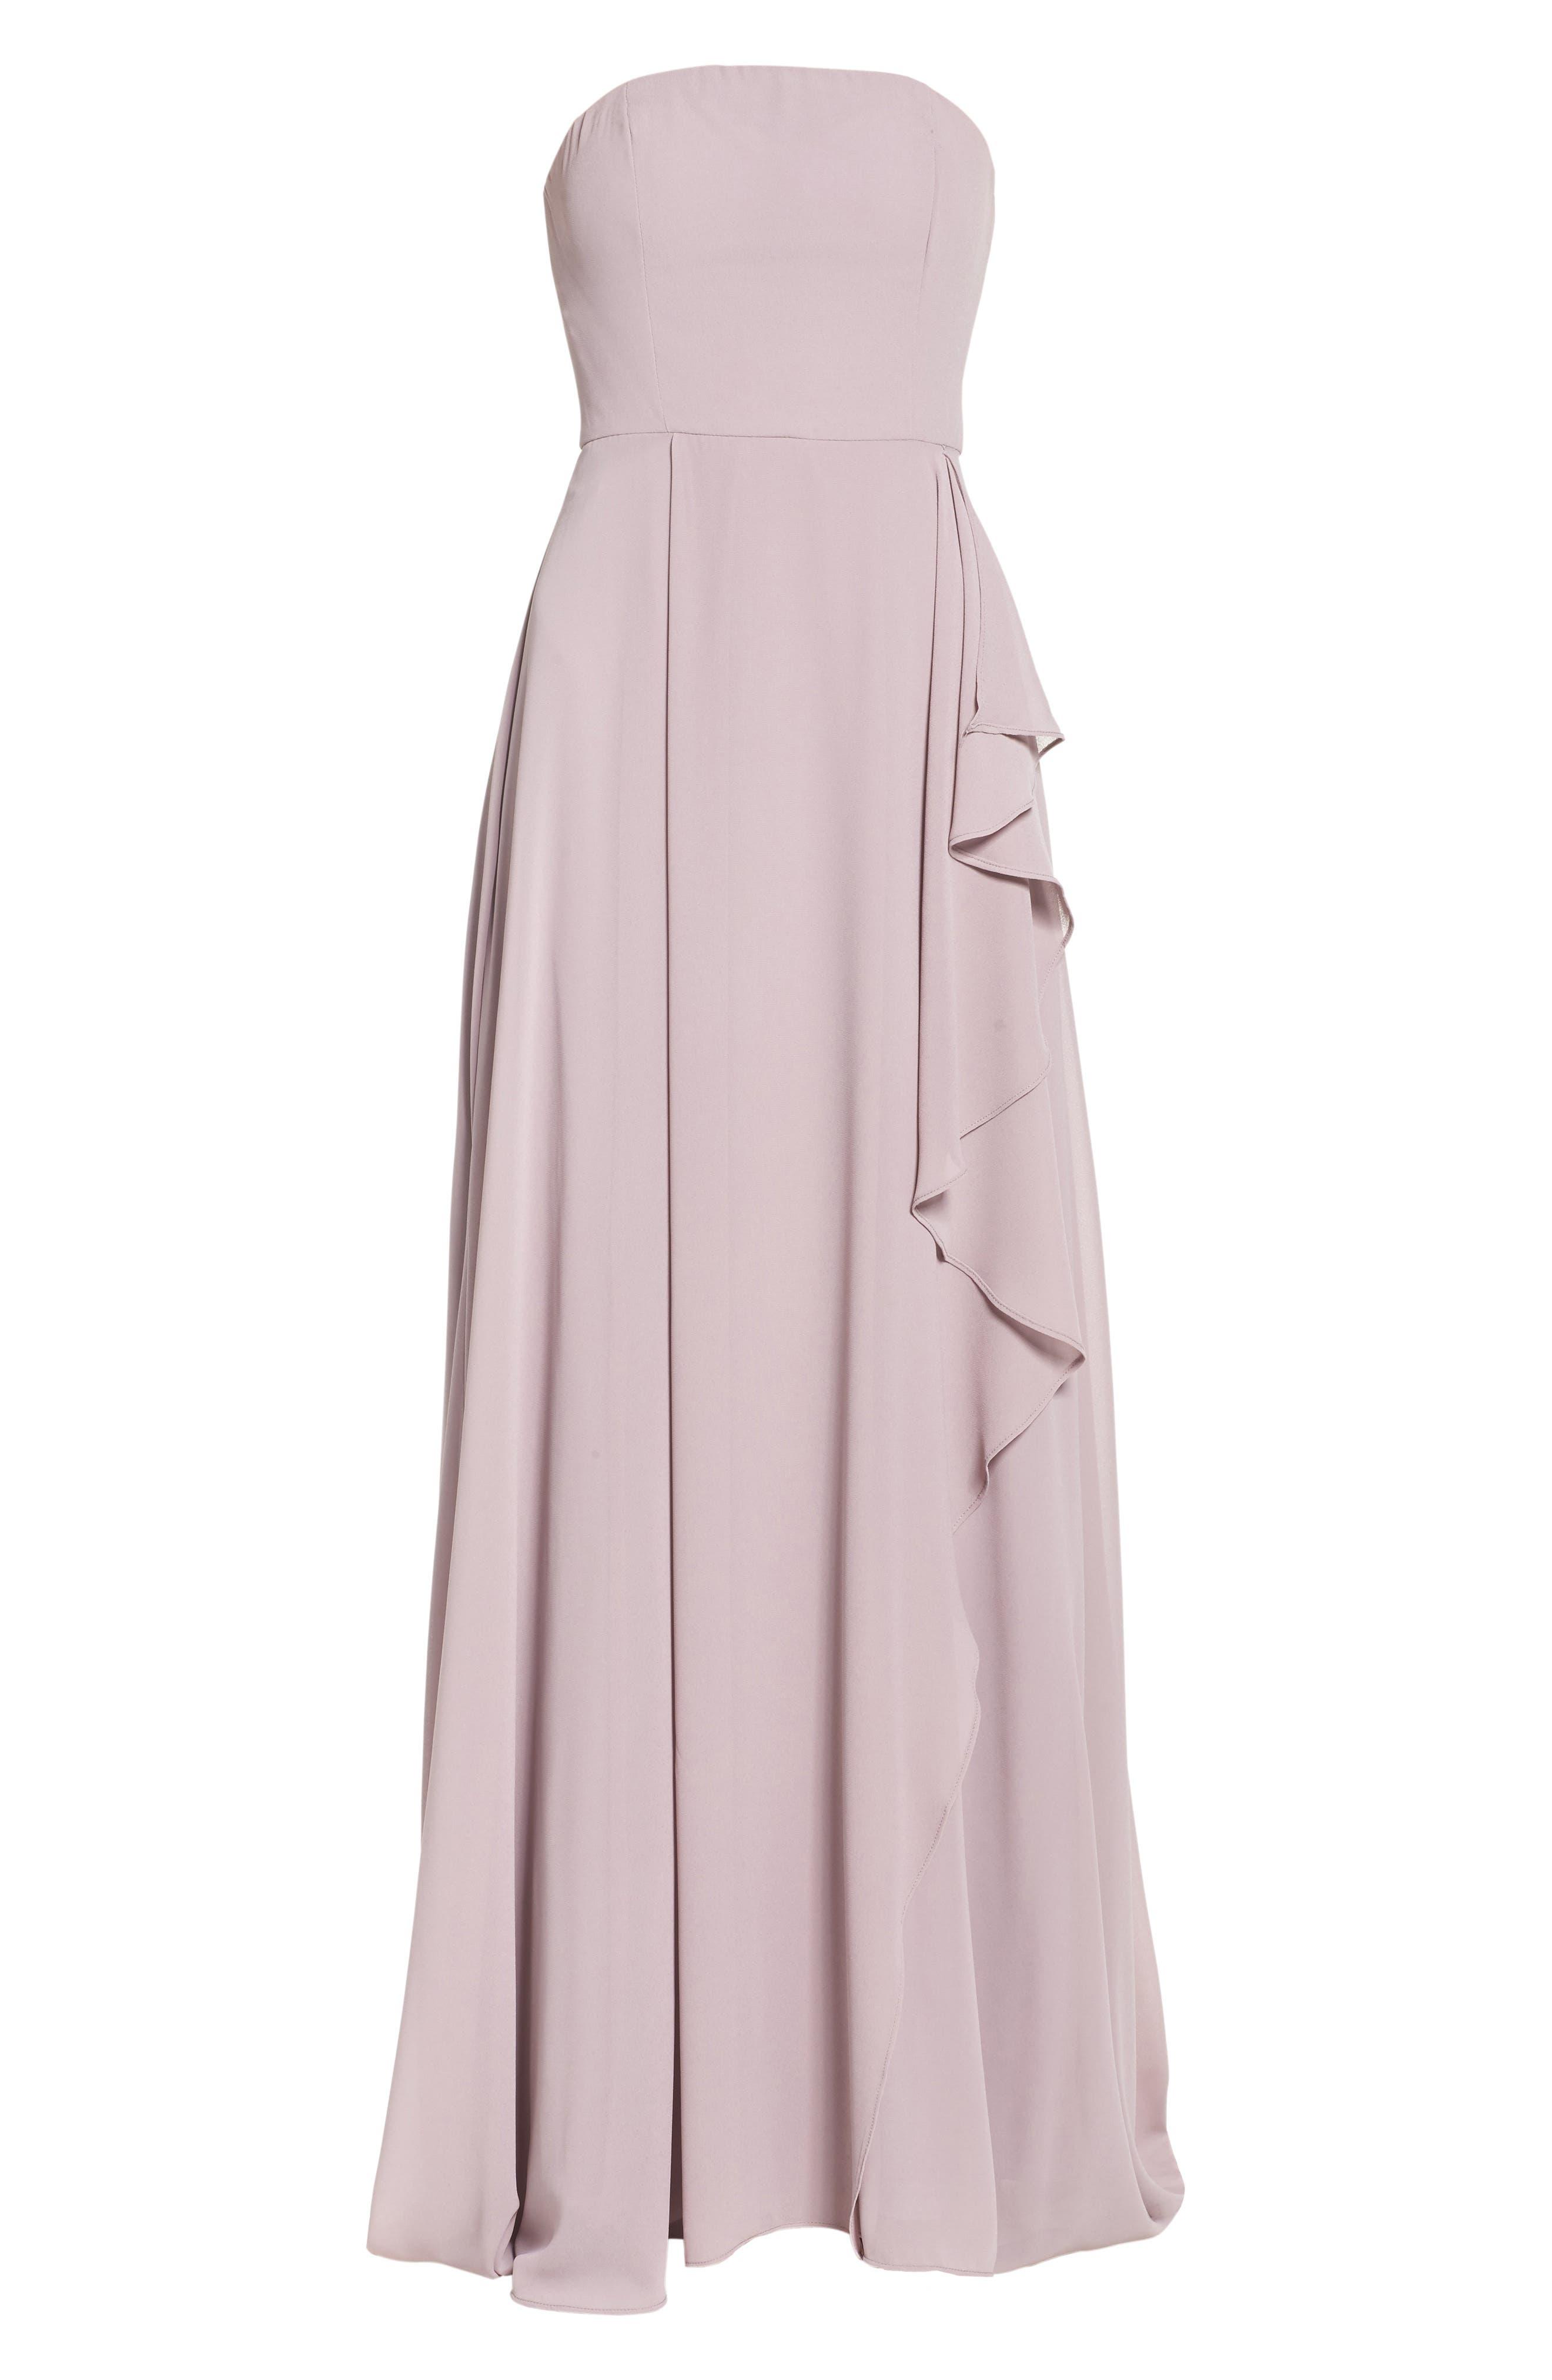 Chiffon Strapless Maxi Dress,                             Alternate thumbnail 6, color,                             020